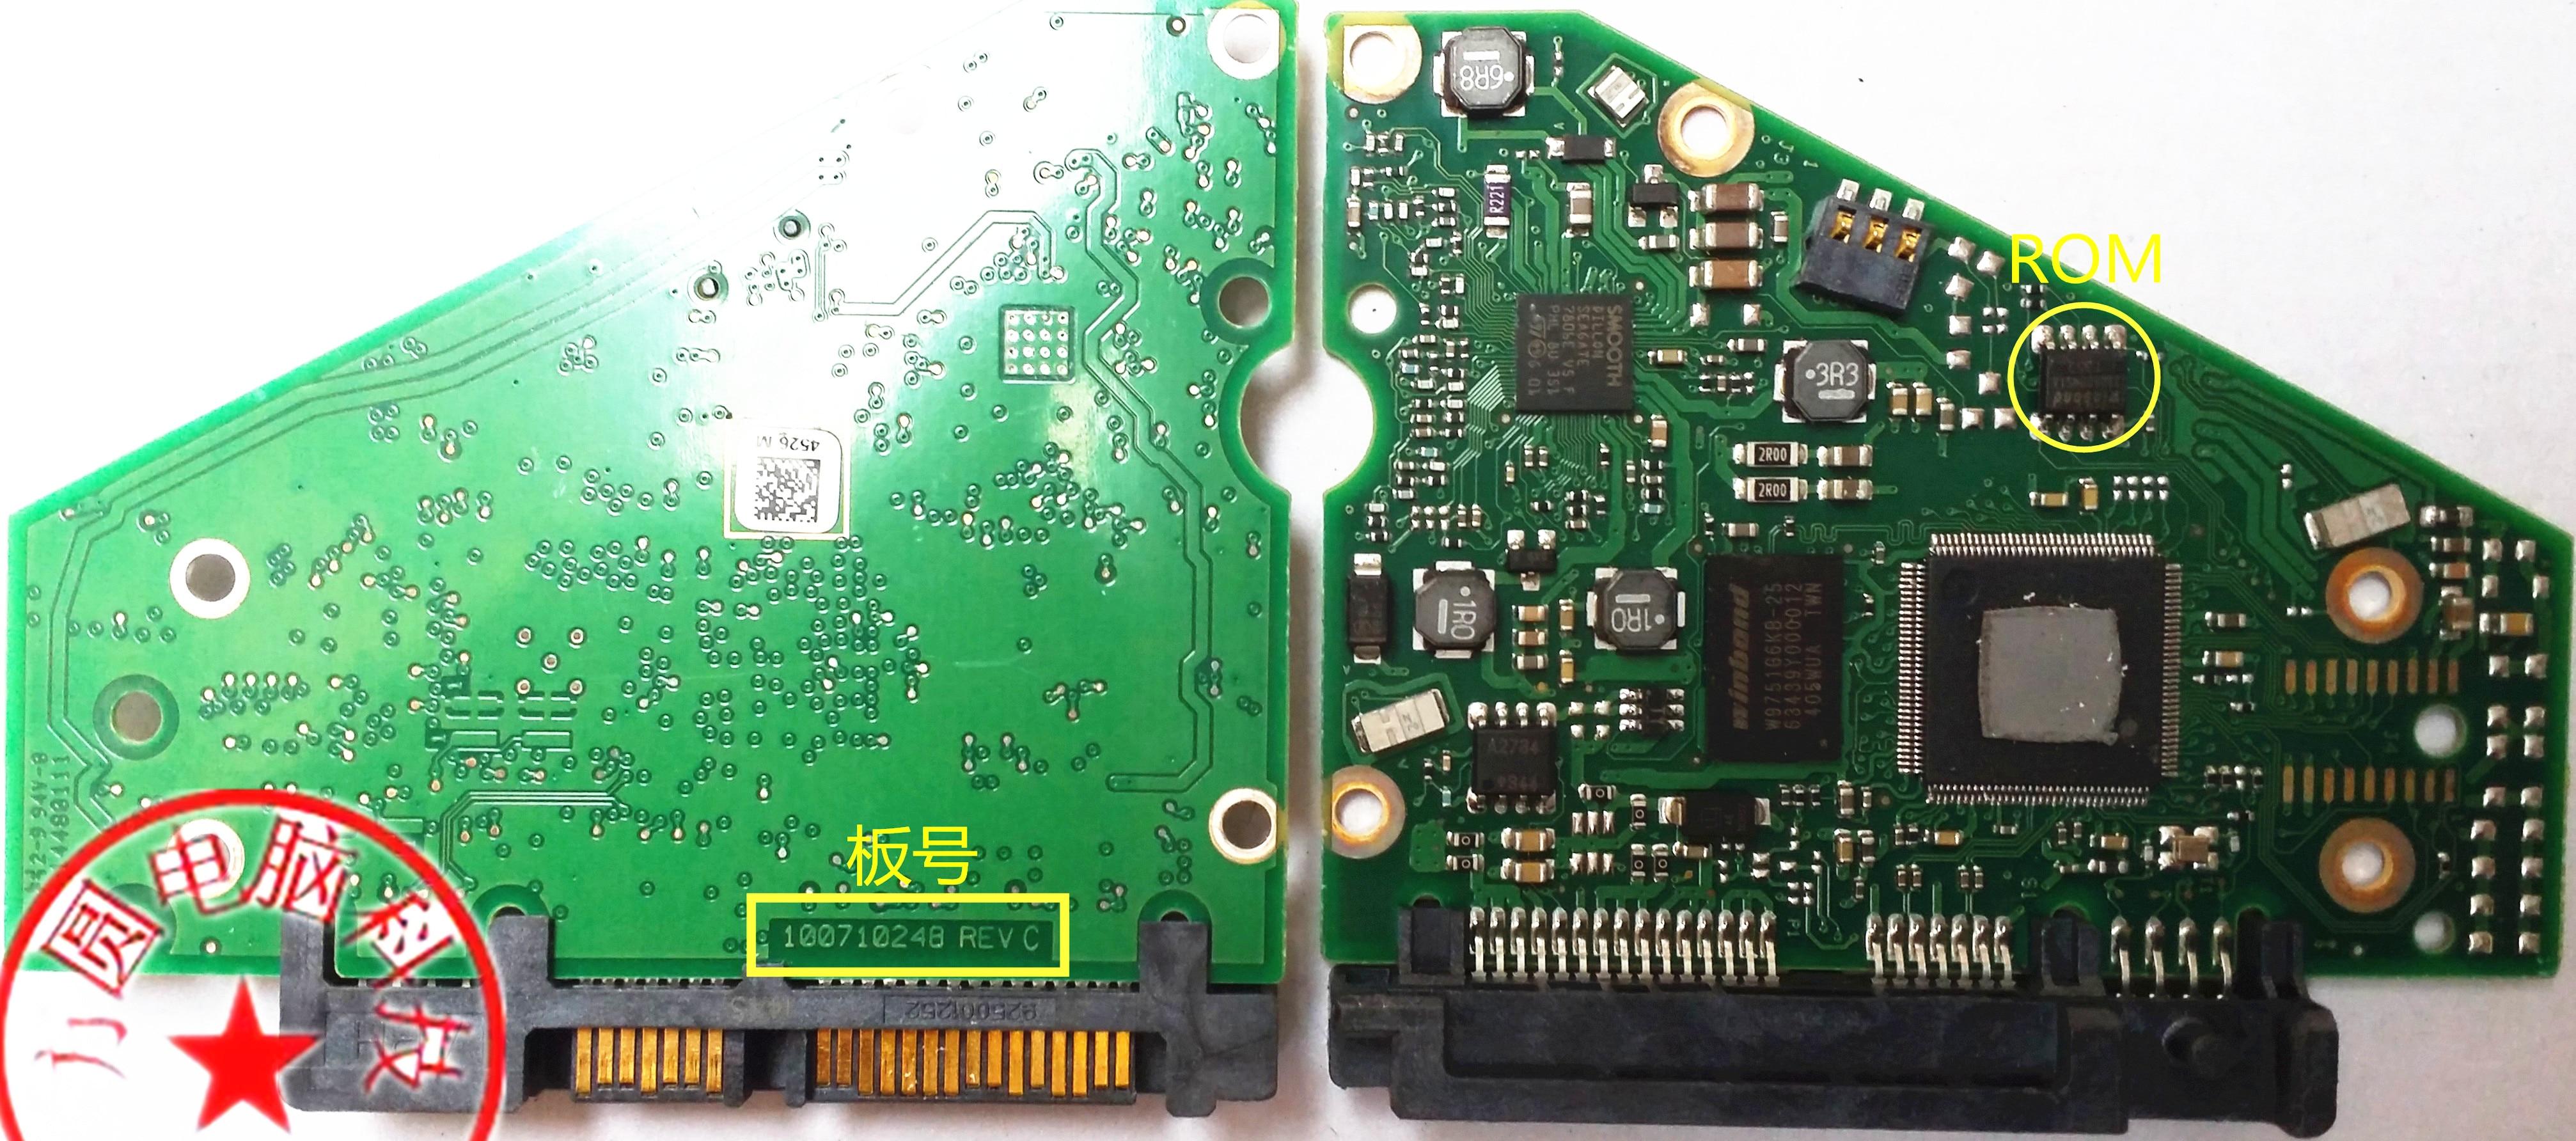 Placa de circuito lógico Original placa de circuito de disco duro 100710248 Rev C placa de circuito PCB de escritorio